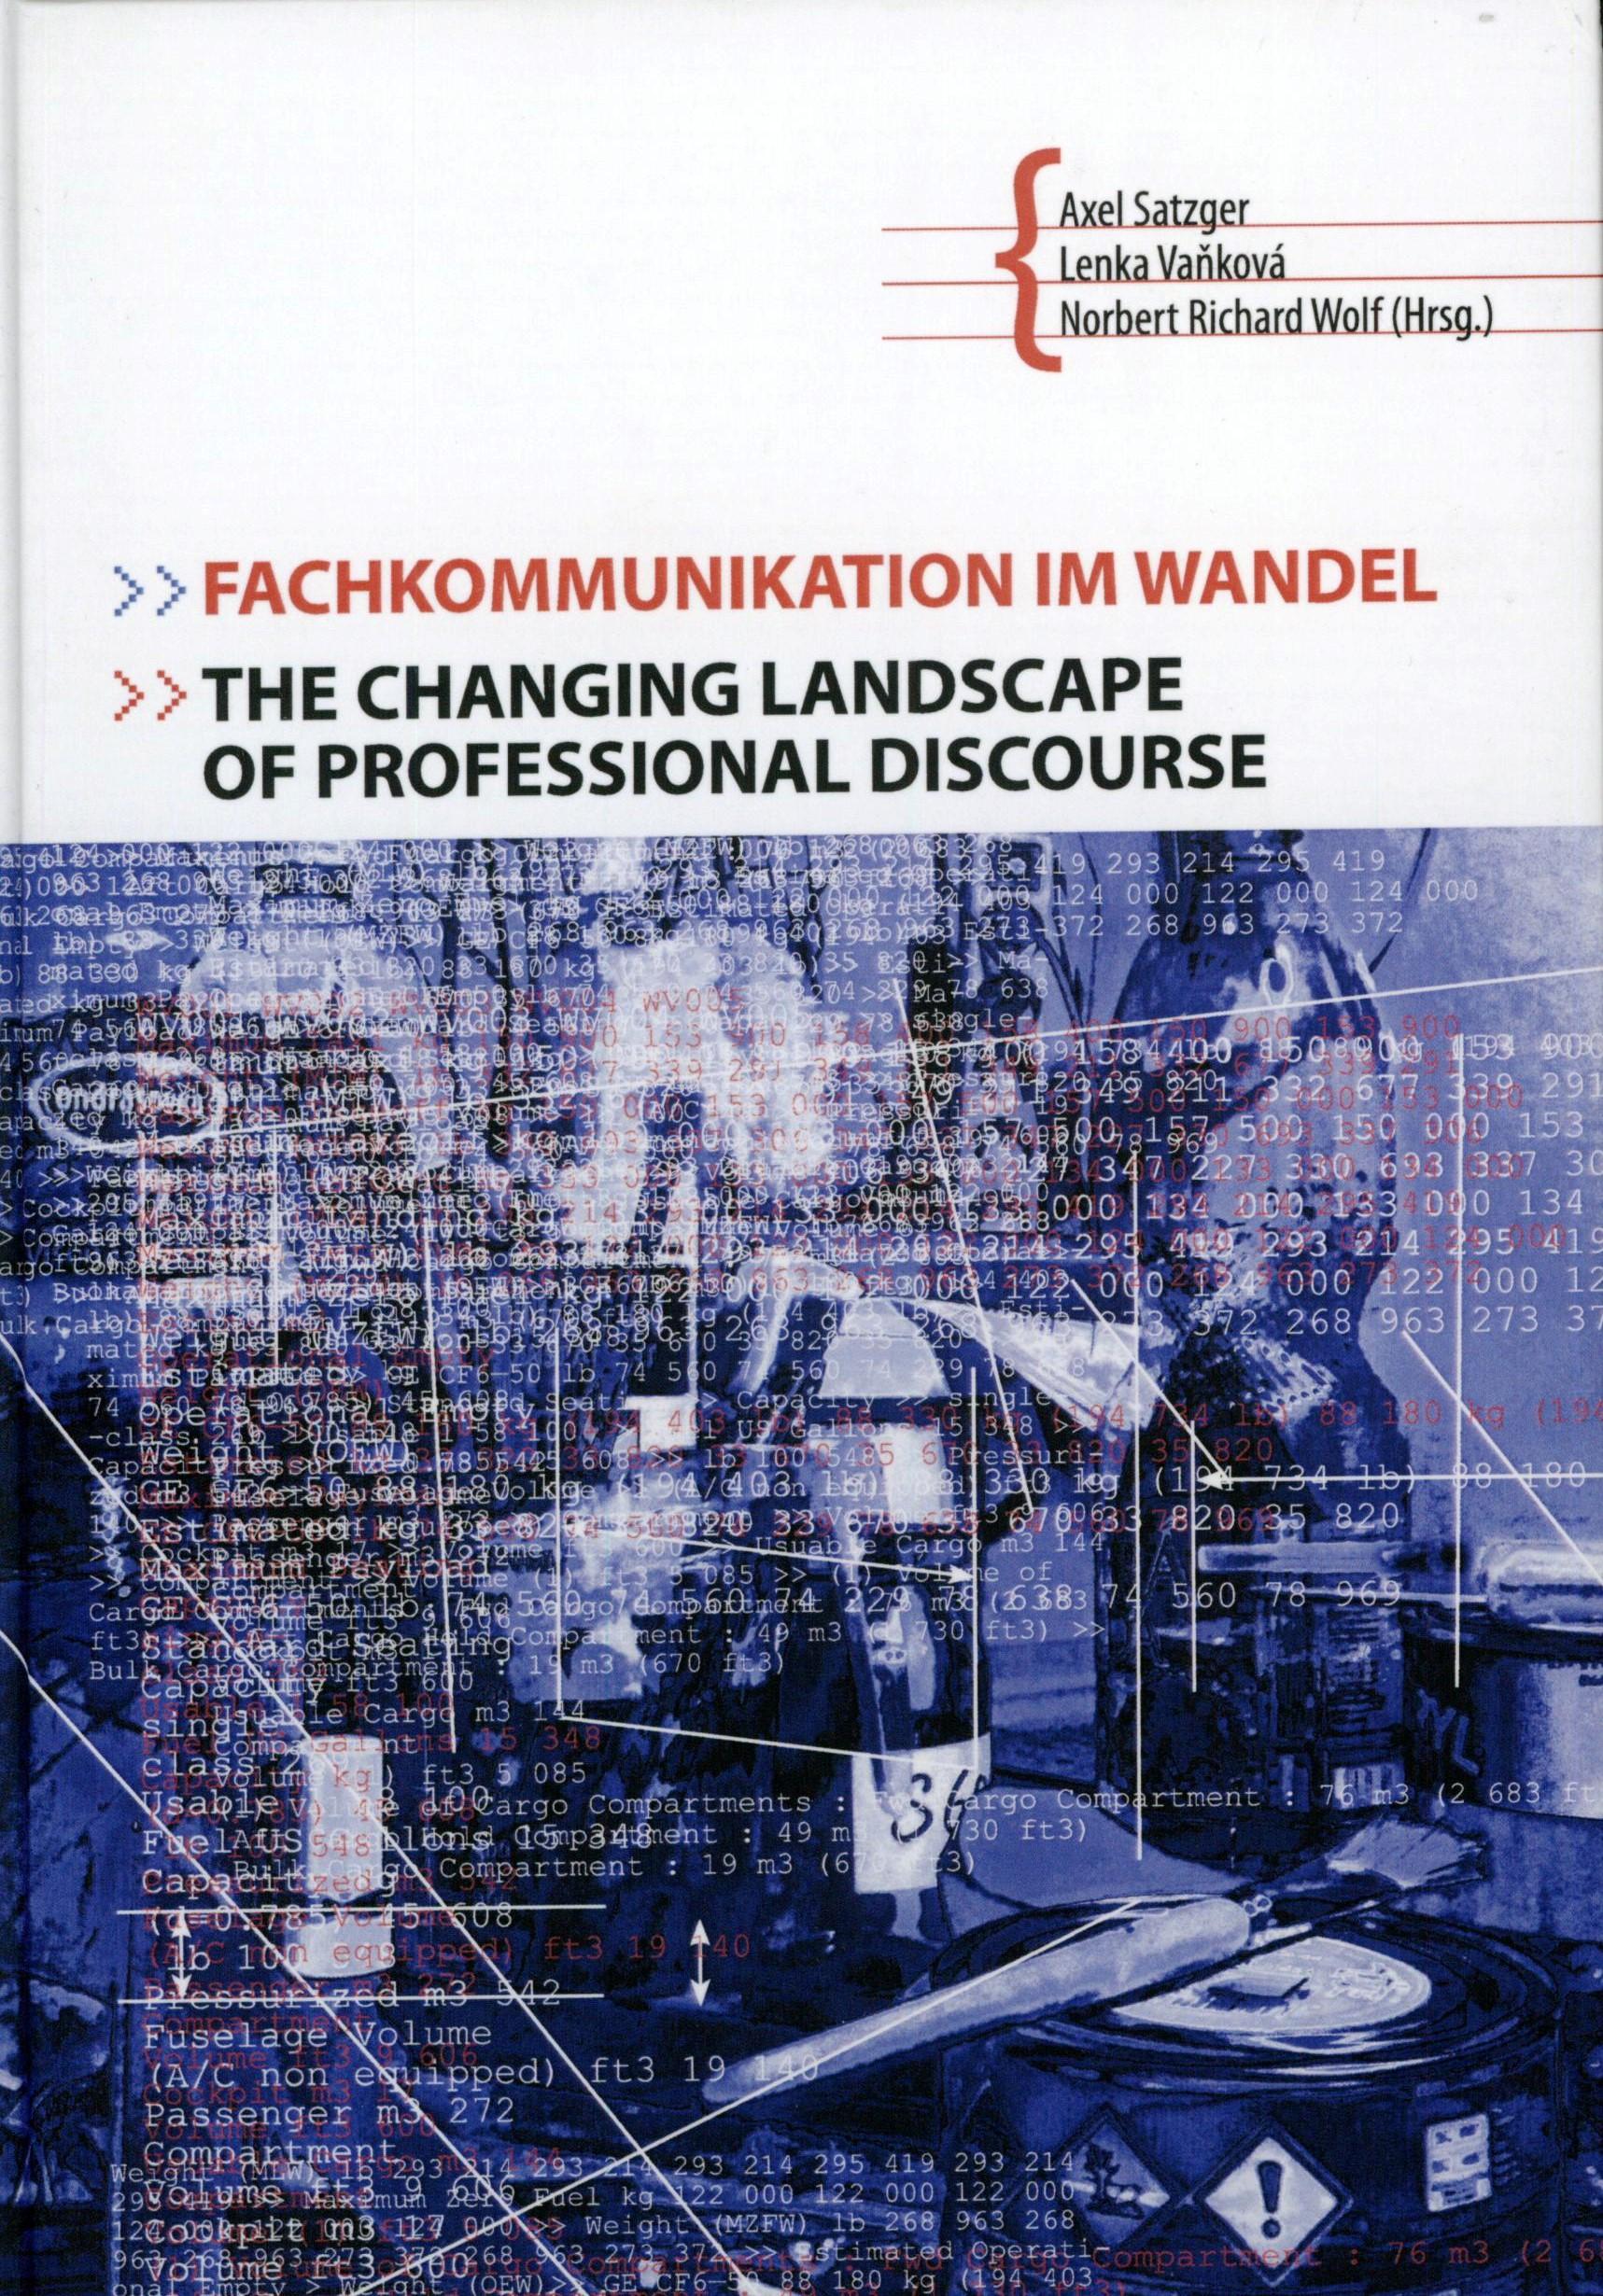 Fachkommunikation im Wandel / TheChanging Landscape ofProfessional Discourse